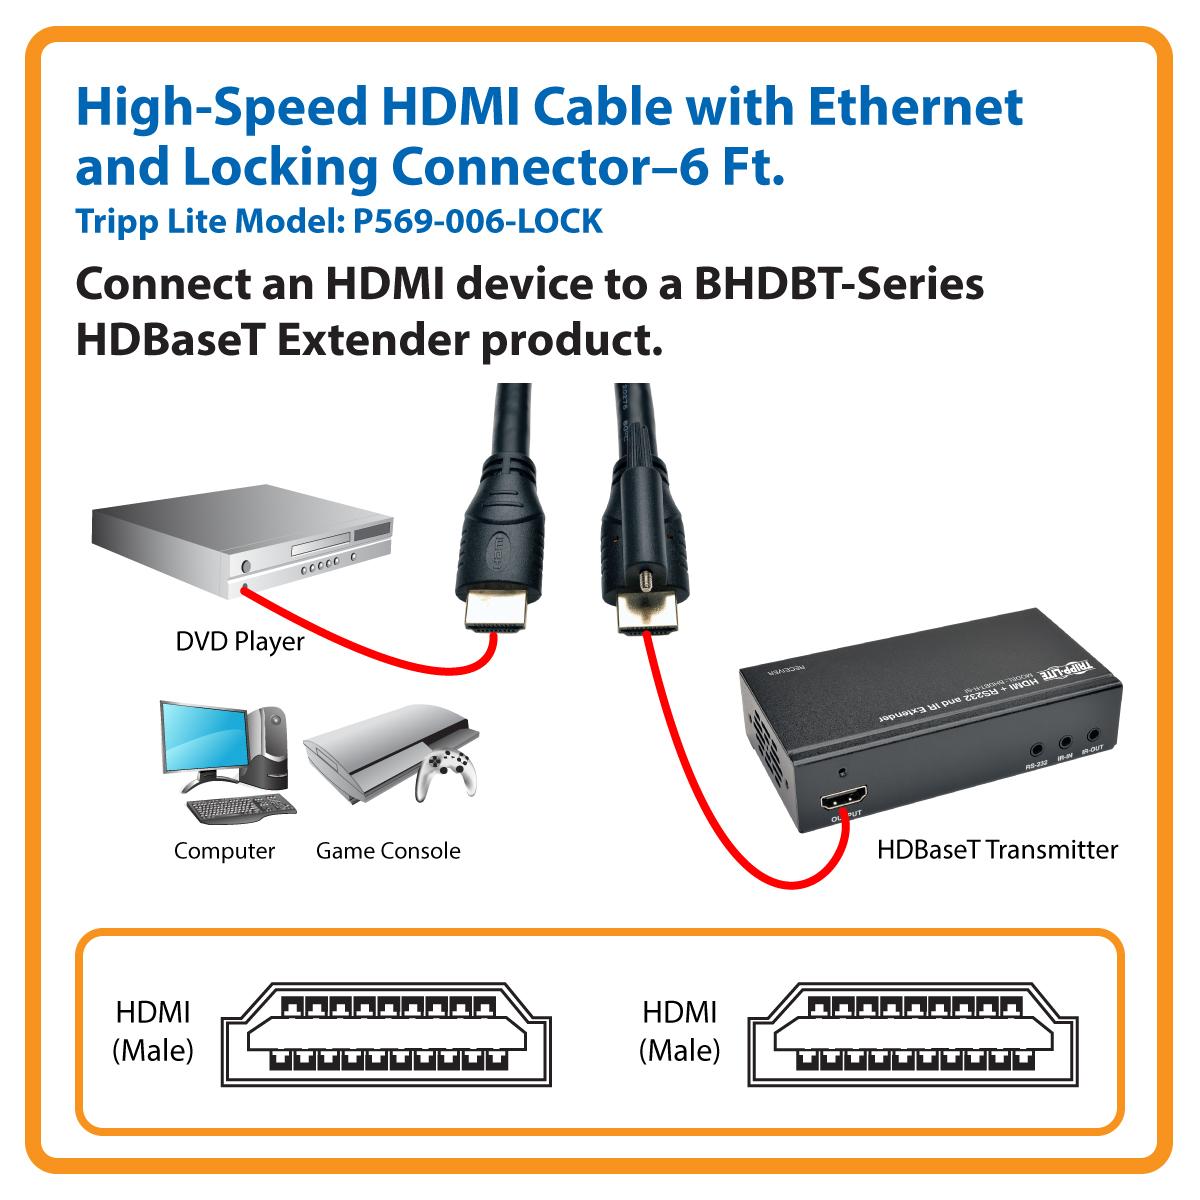 Tripp Lite High Speed Hdmi Cable Ethernet Locking Ultra Hd 4k X 2k M Hdbaset Litetm Transmitter 6ft P569 006 Lock Audio Video Products